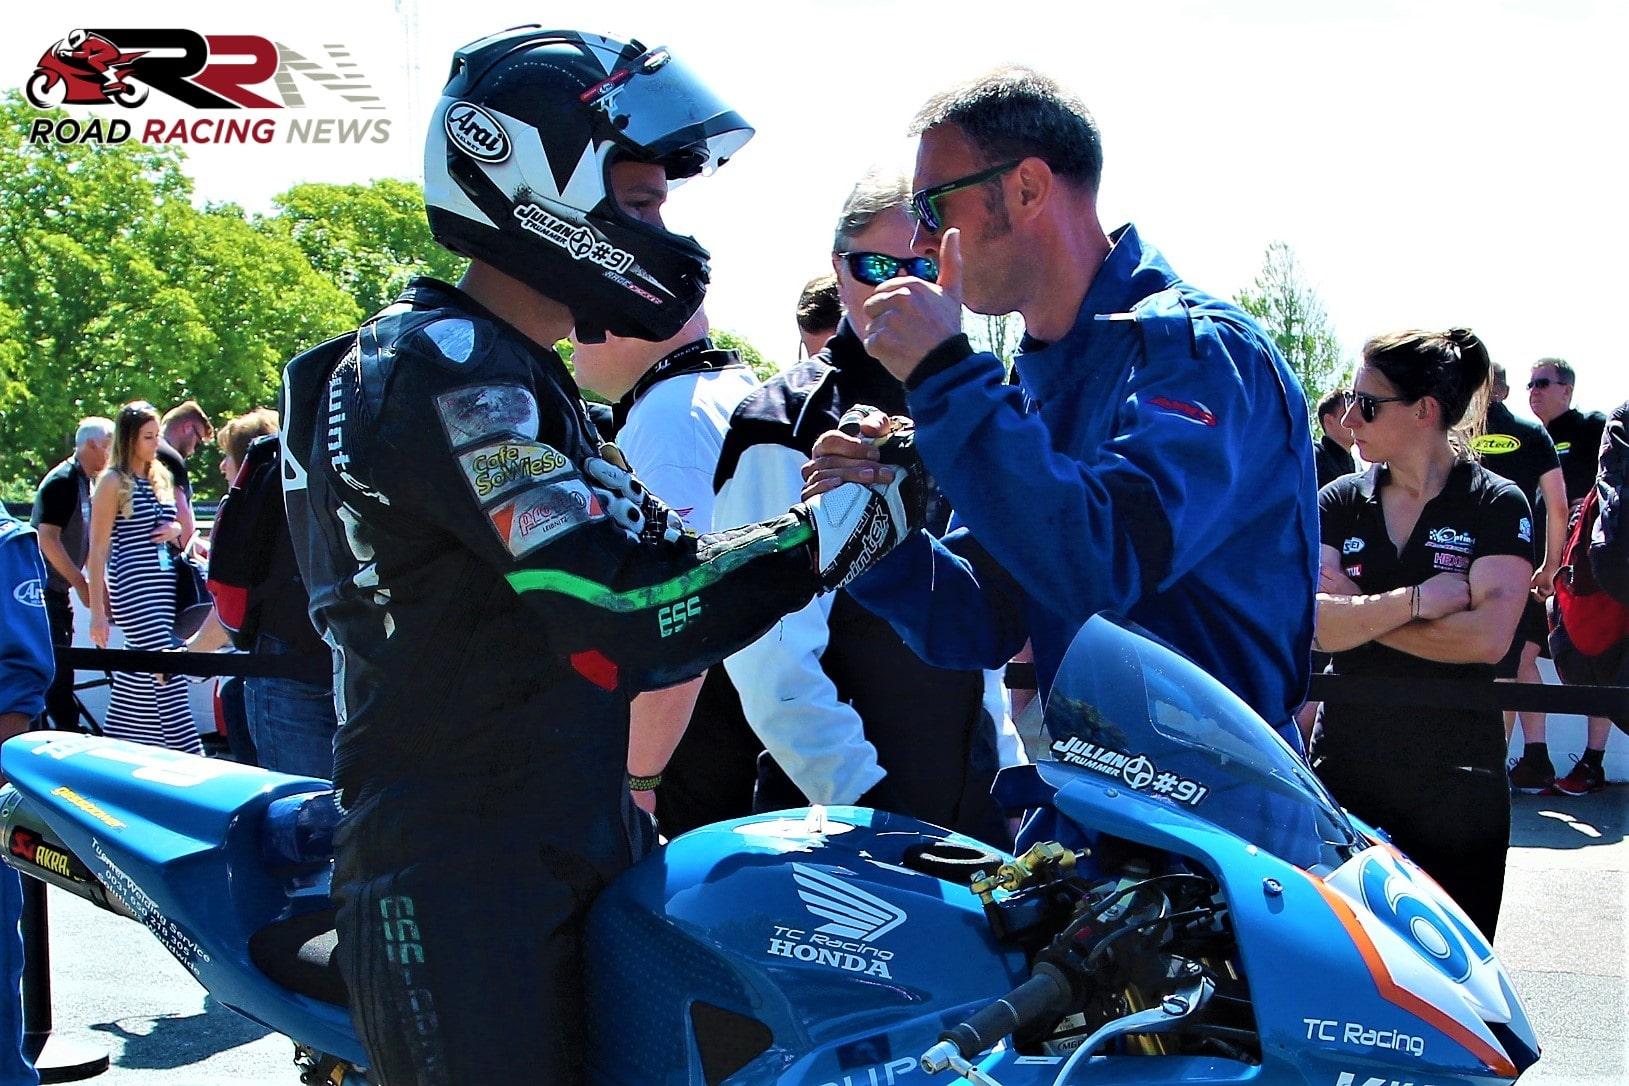 Manx GP Top 6: Mick Charnock